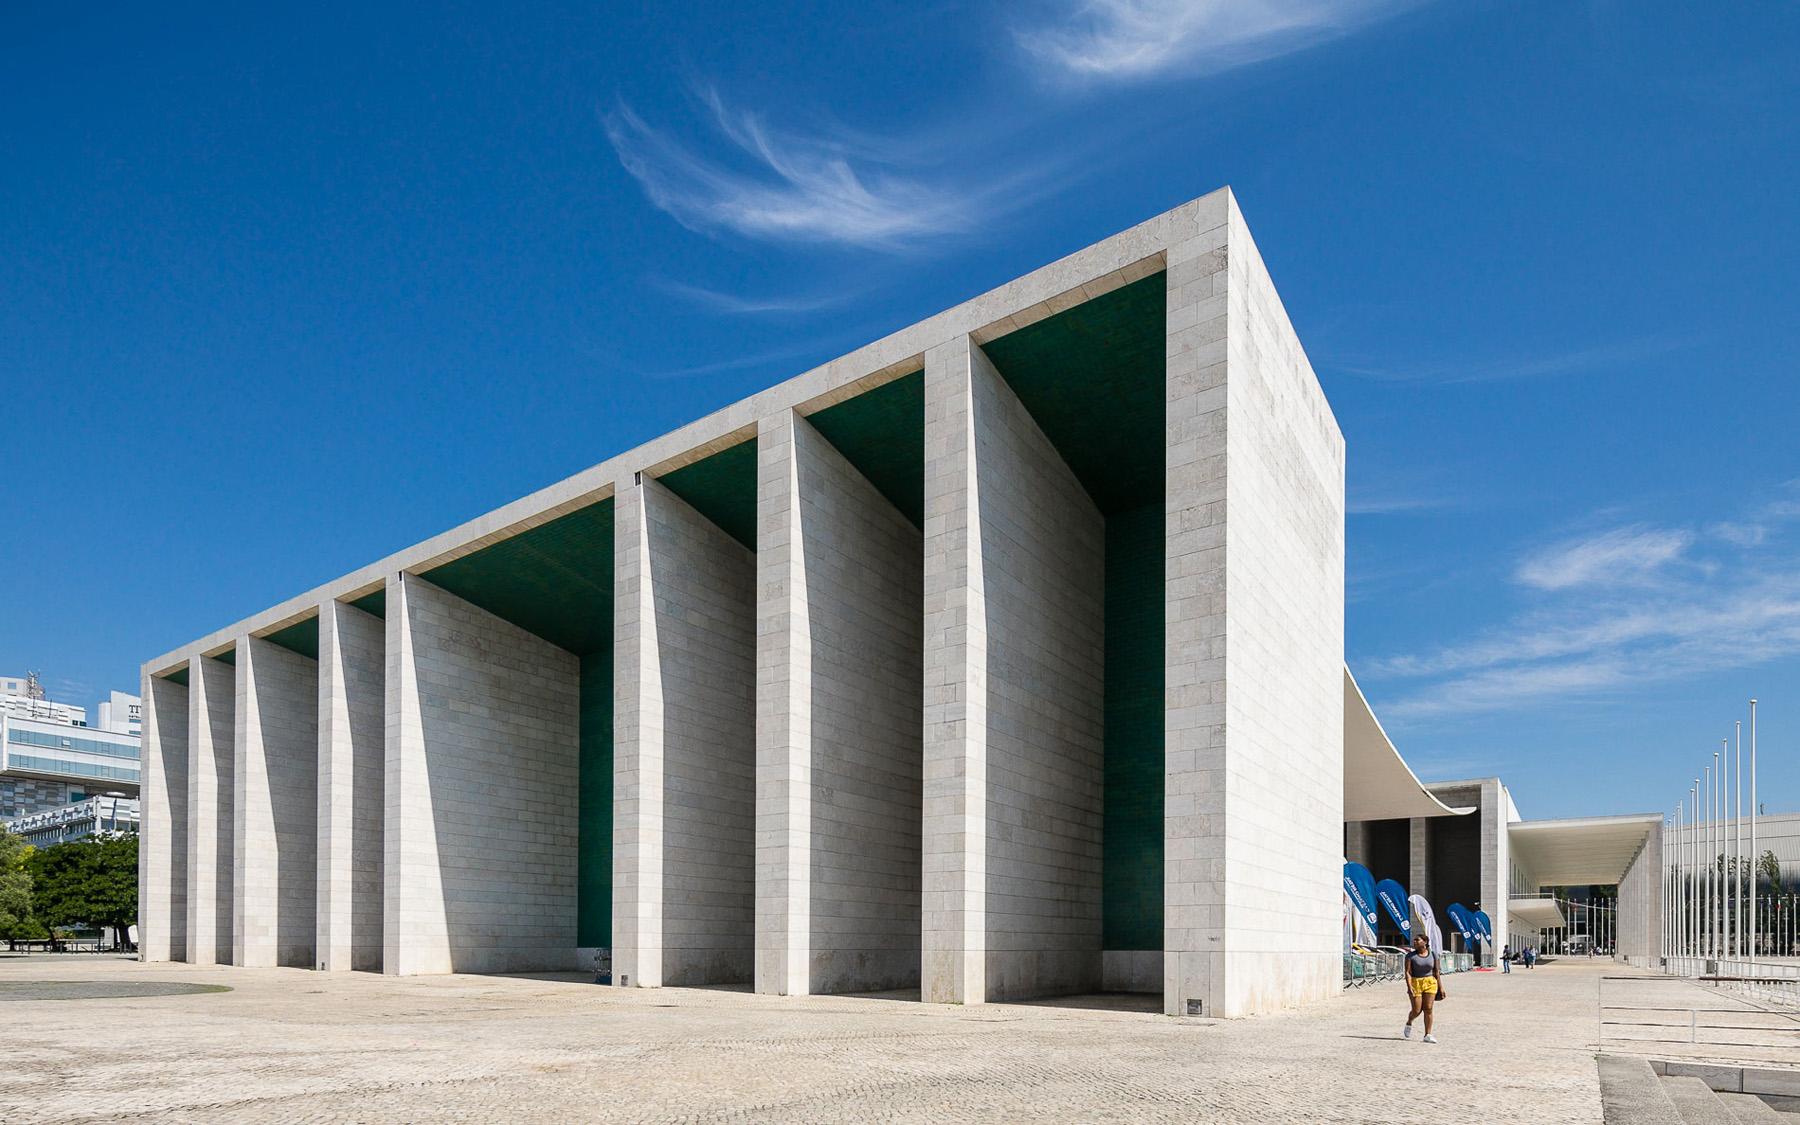 180623 Lisbon 187.jpg